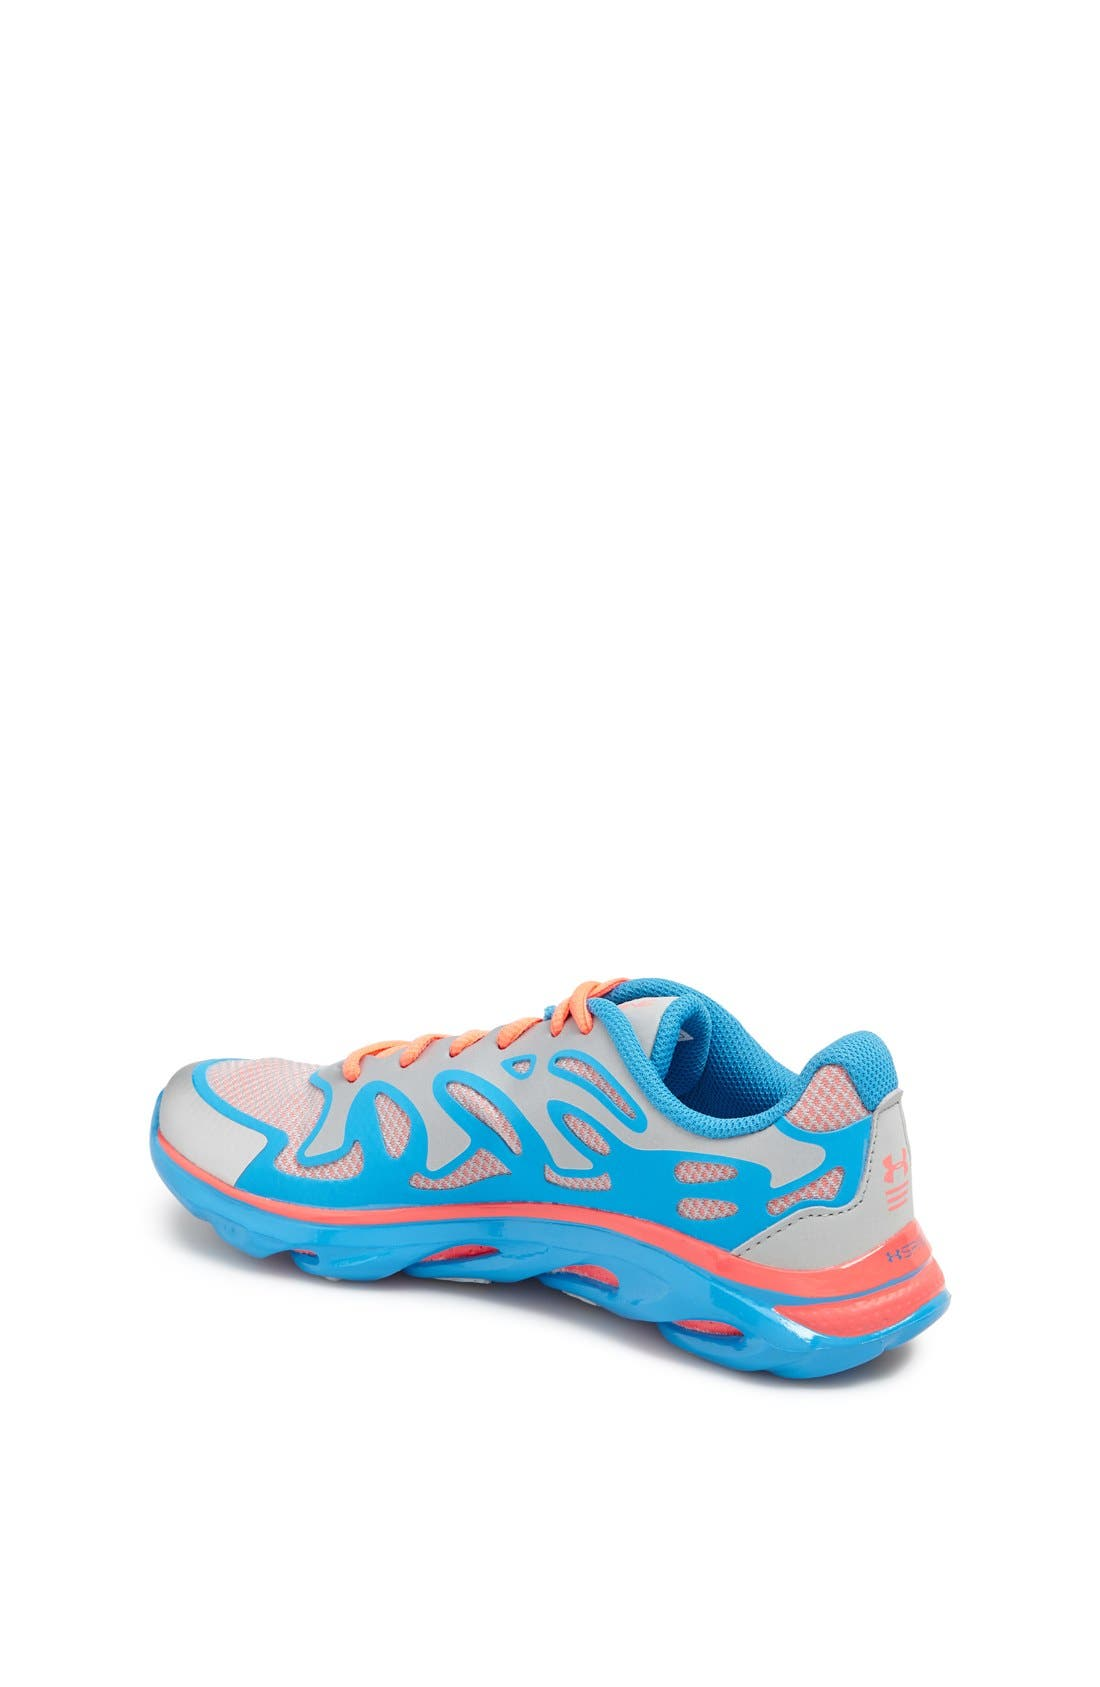 Alternate Image 2  - Under Armour 'Spine' Athletic Shoe (Big Kid)